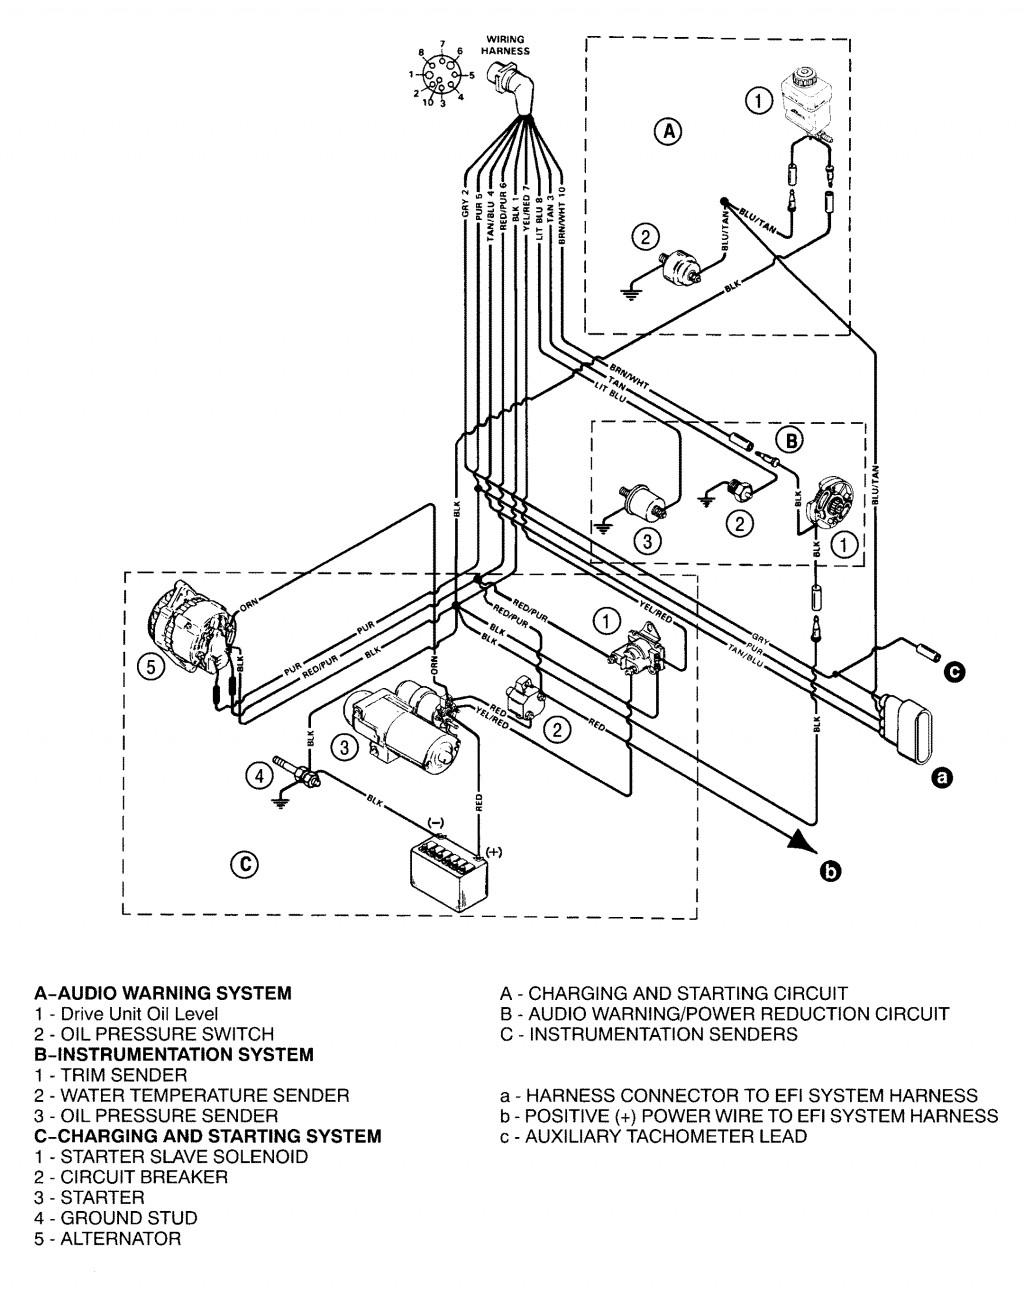 Phenomenal Mercruiser Trim Motor Wiringm Picture Inspirations Alphammercruiser Home › Wiring Diagram ›